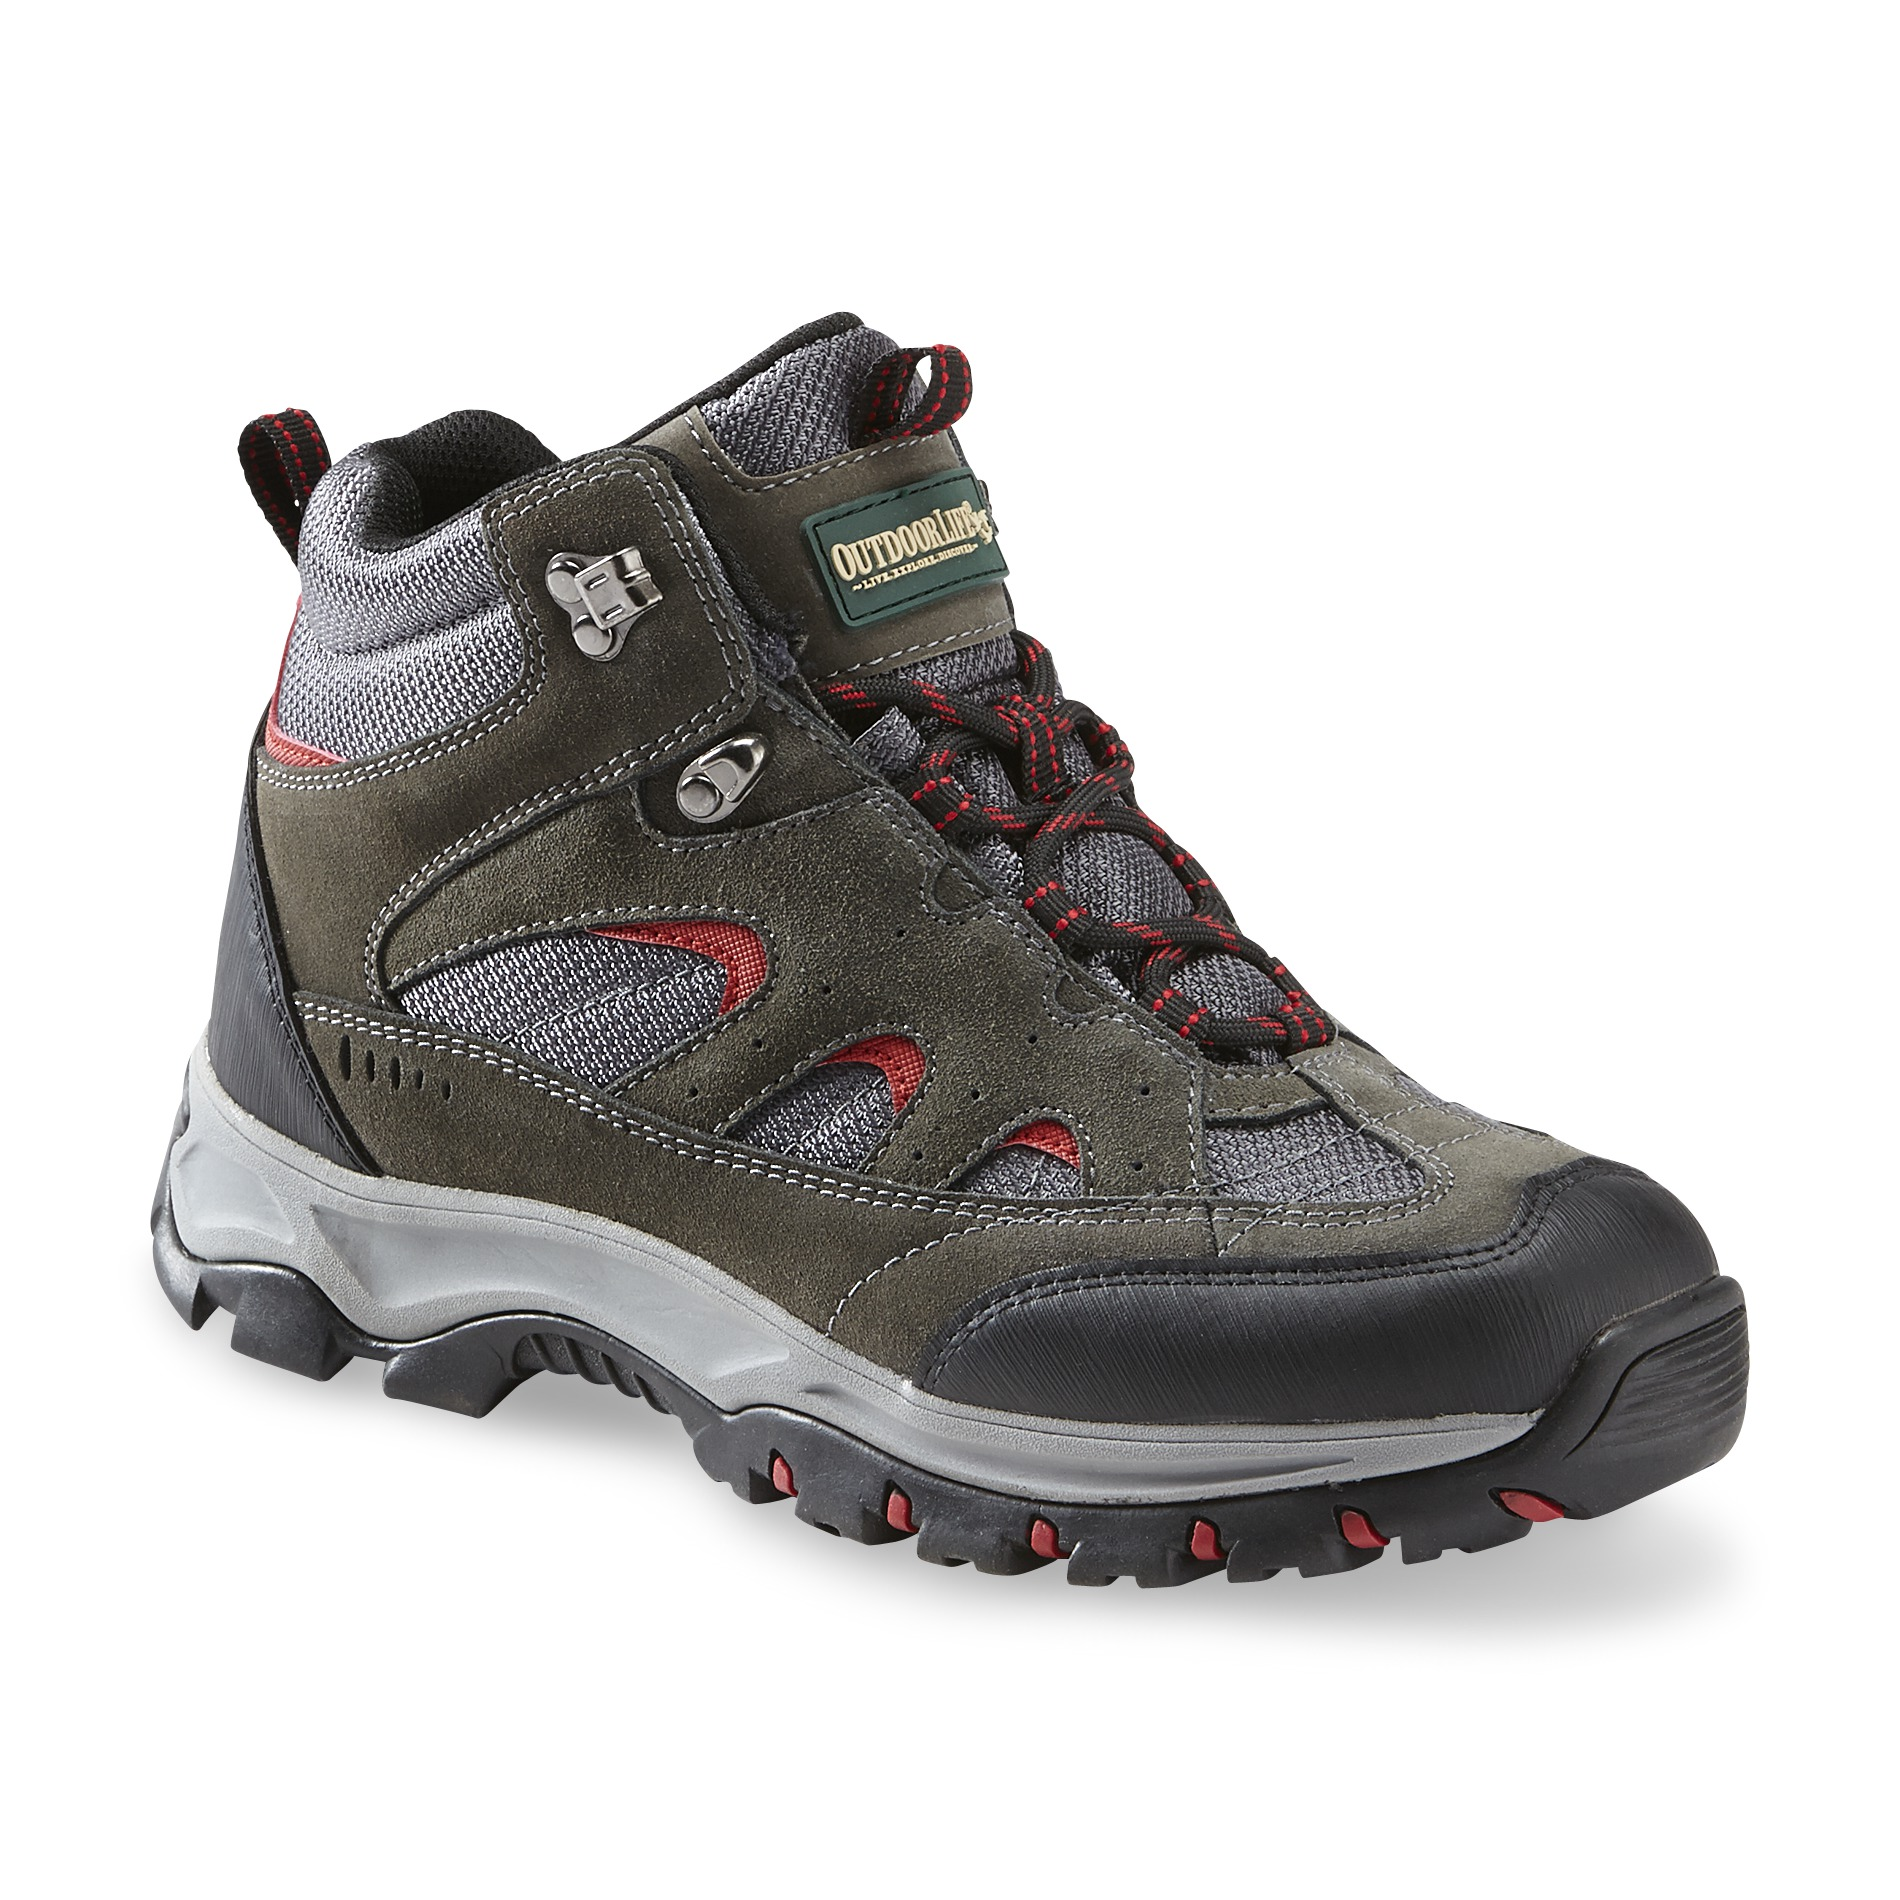 Outdoor Life Men's Lewis Suede/Mesh Hiking Boot -Gray/Red/Black PartNumber: 067VA77823512P MfgPartNumber: 49509